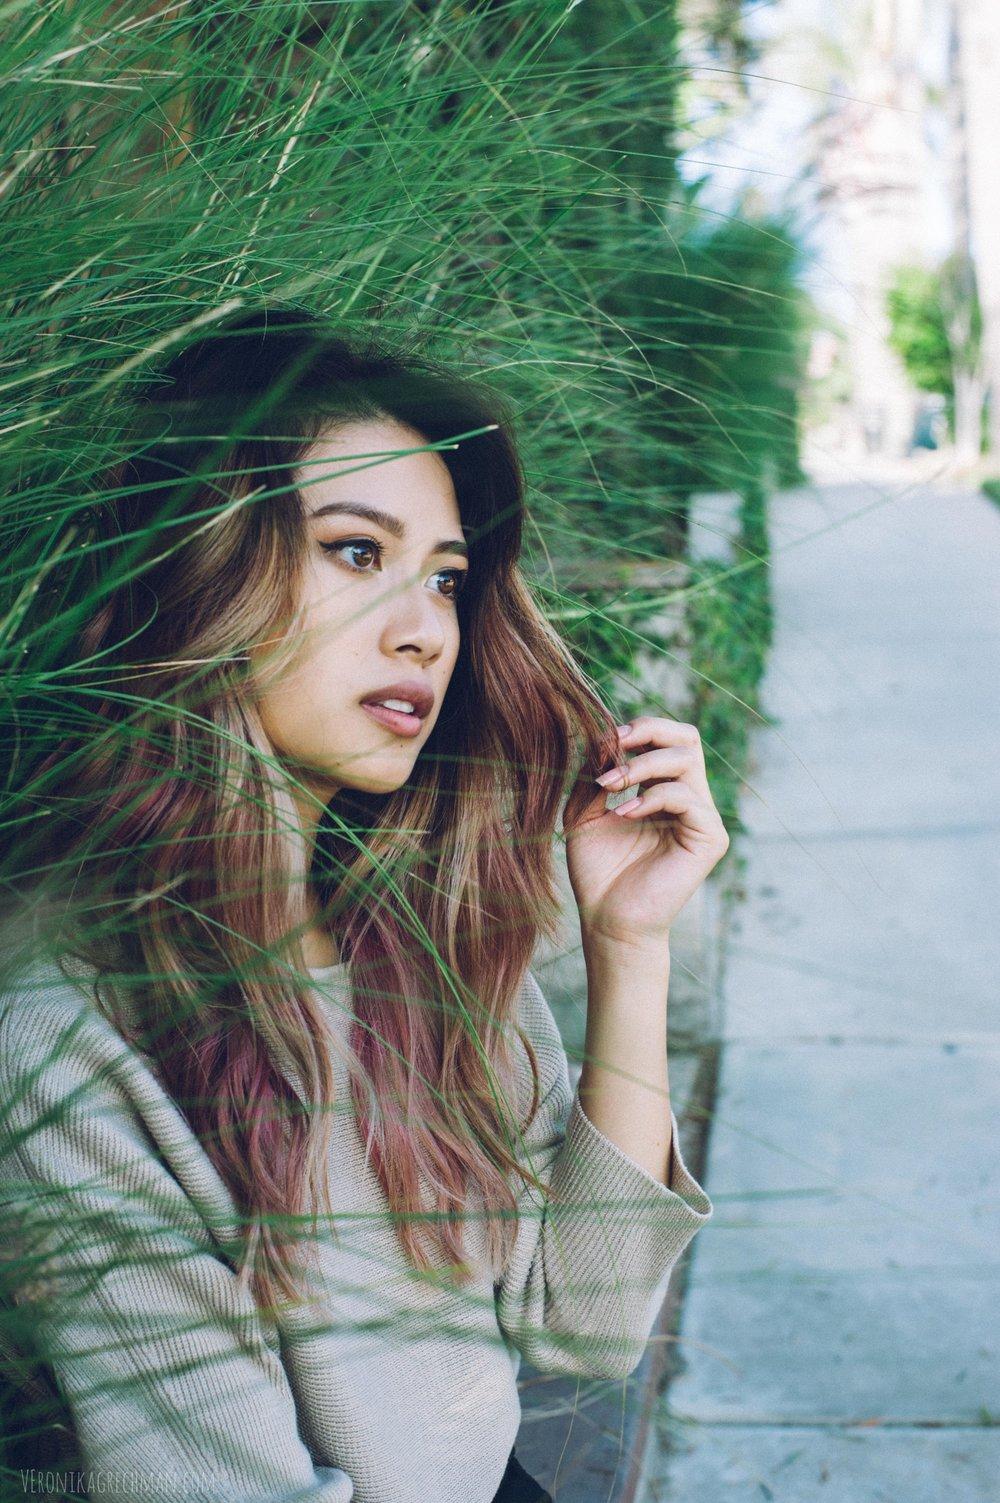 Women photoshoot style and inspiration